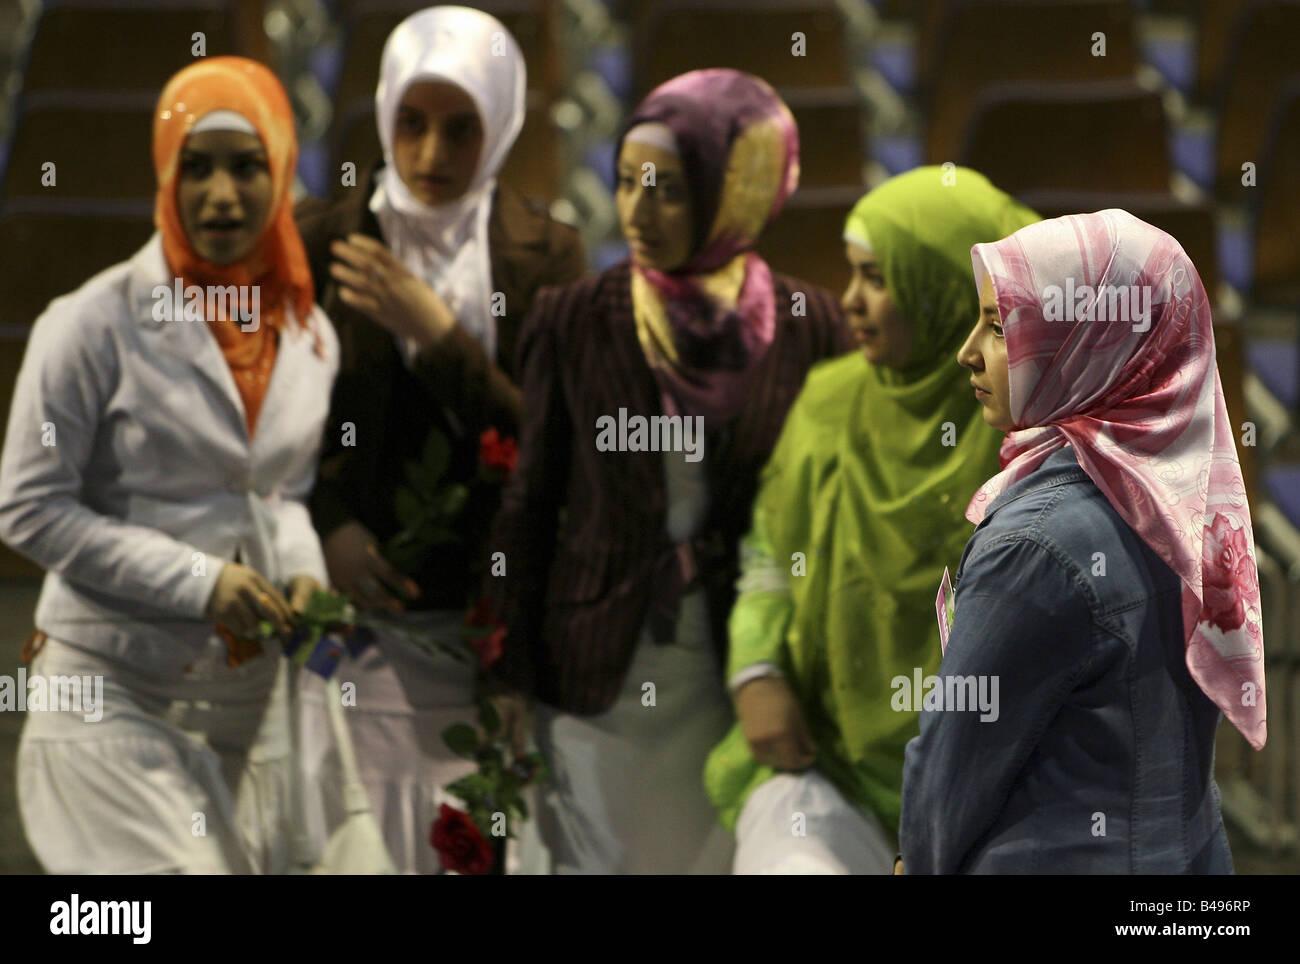 Muslim girls wearing hijabs, Berlin, Germany - Stock Image